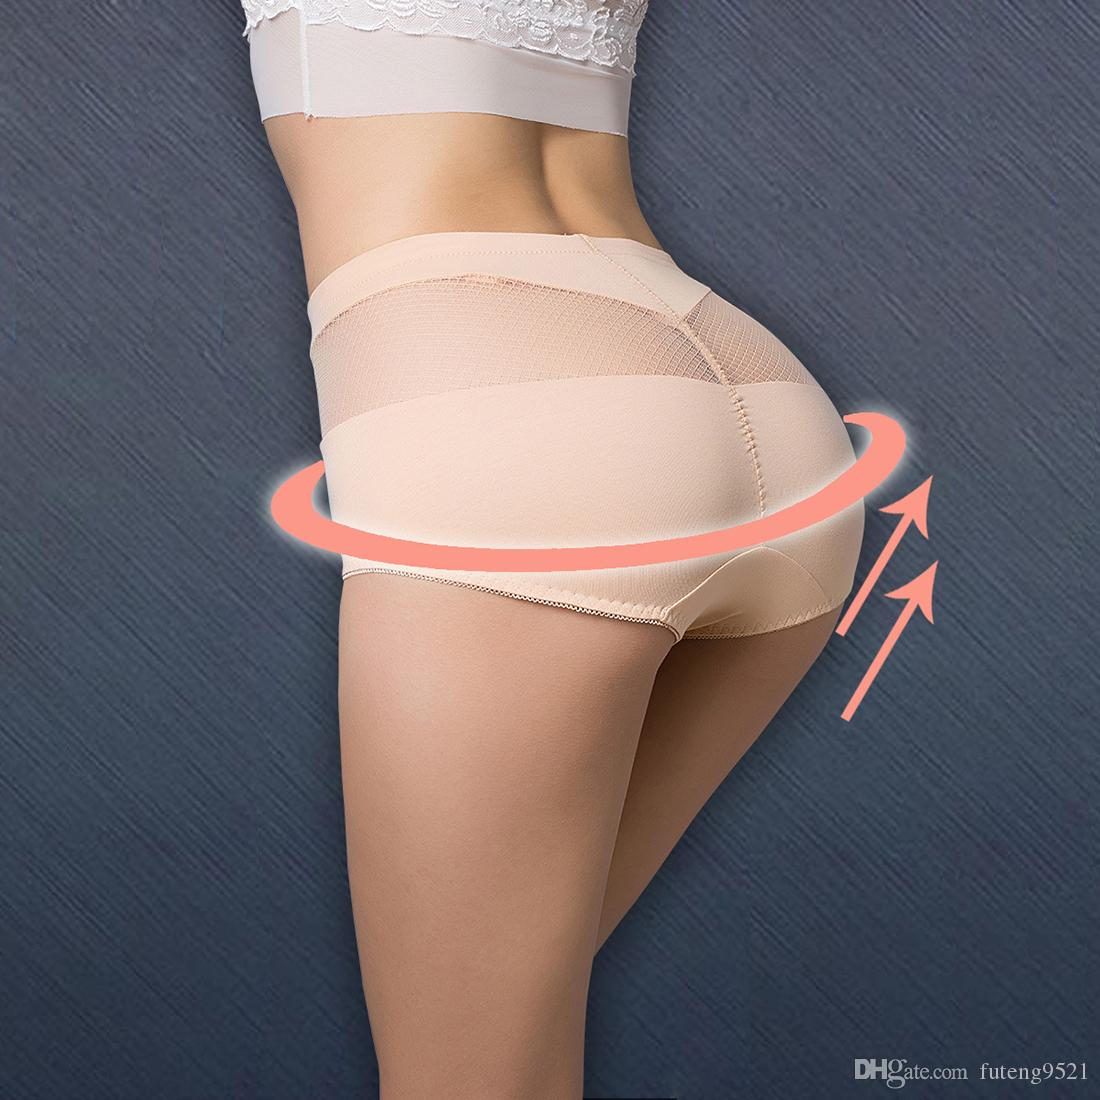 41a965abb Pure Color High Waist Panties Cotton Briefs Women Sexy Underwear ...